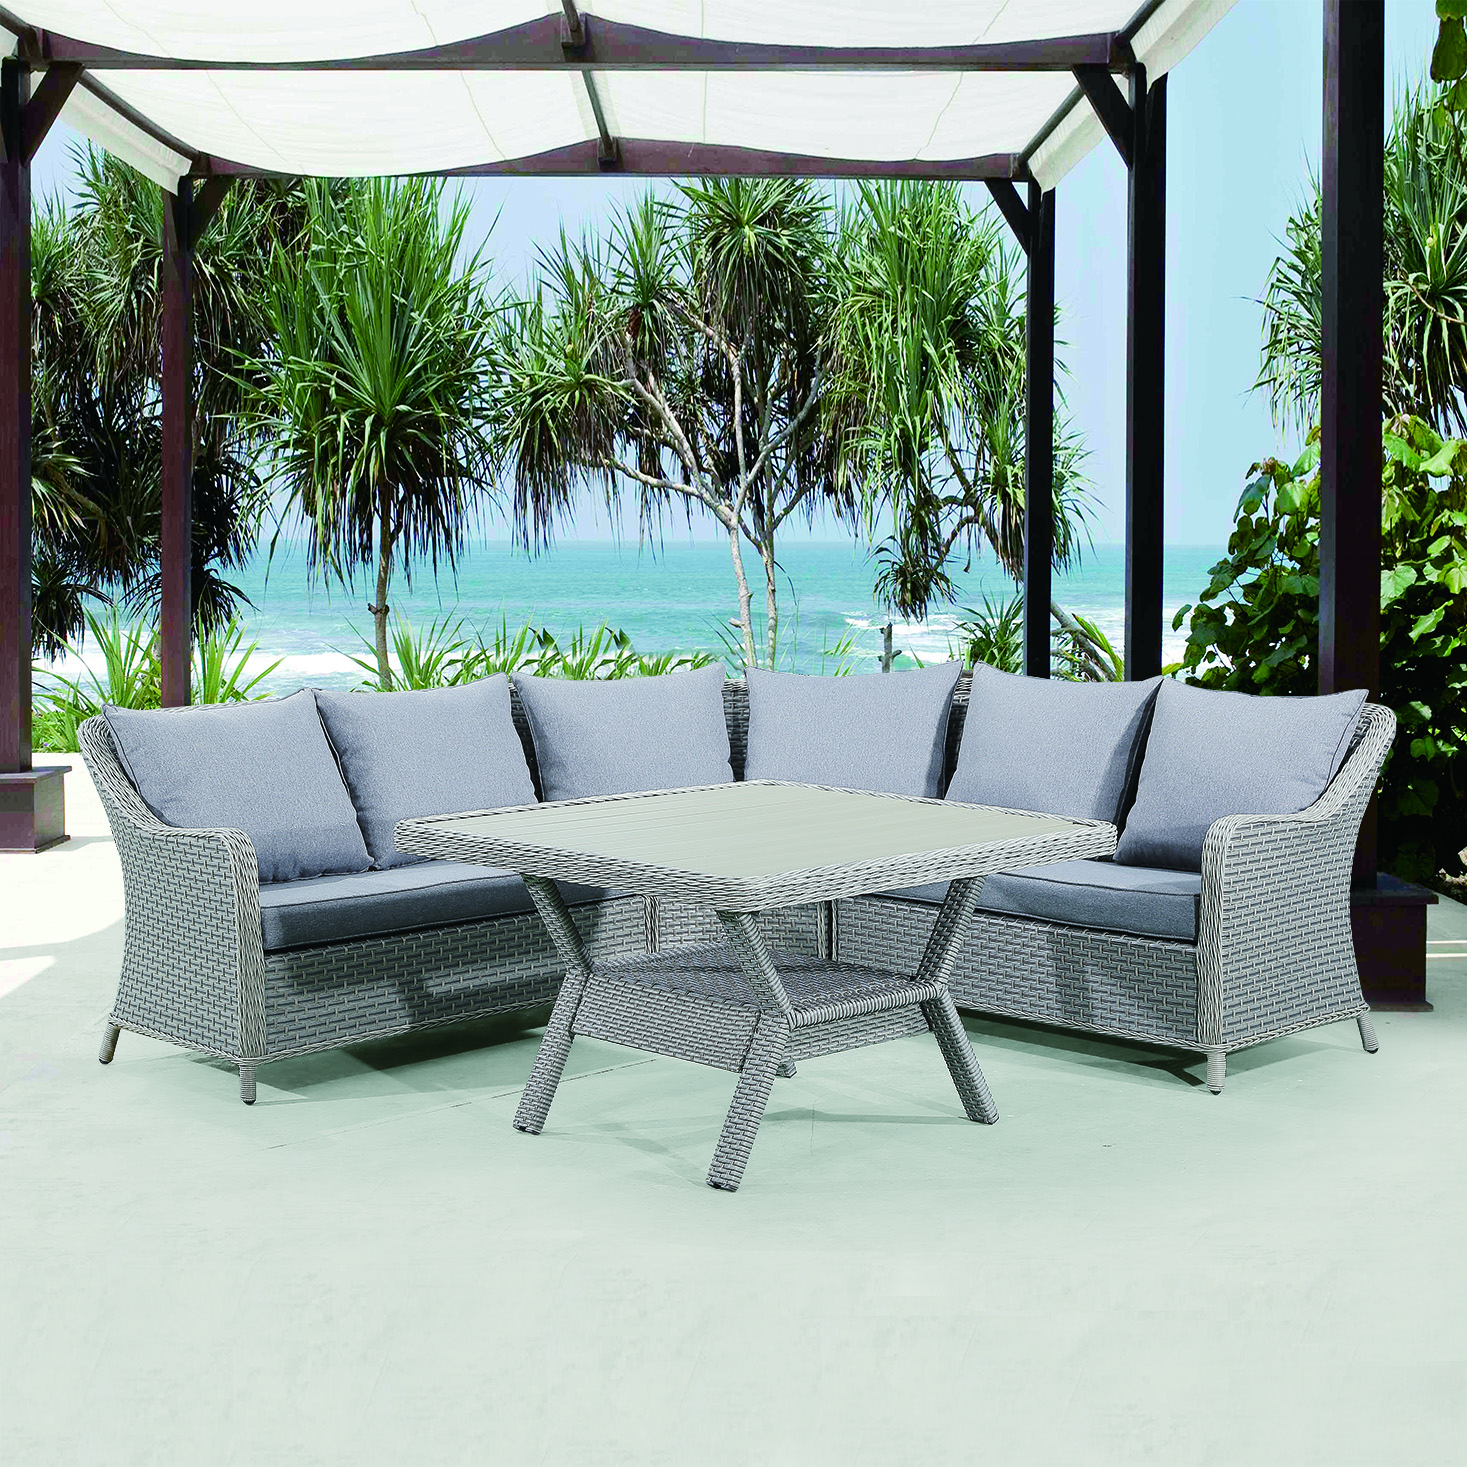 Brilliant Rattan Garden Furniture Outdoor 3 Seater Sofa Buy Outdoor Garden Sofa Garden Sofa Outdoor Sofa Product On Alibaba Com Creativecarmelina Interior Chair Design Creativecarmelinacom